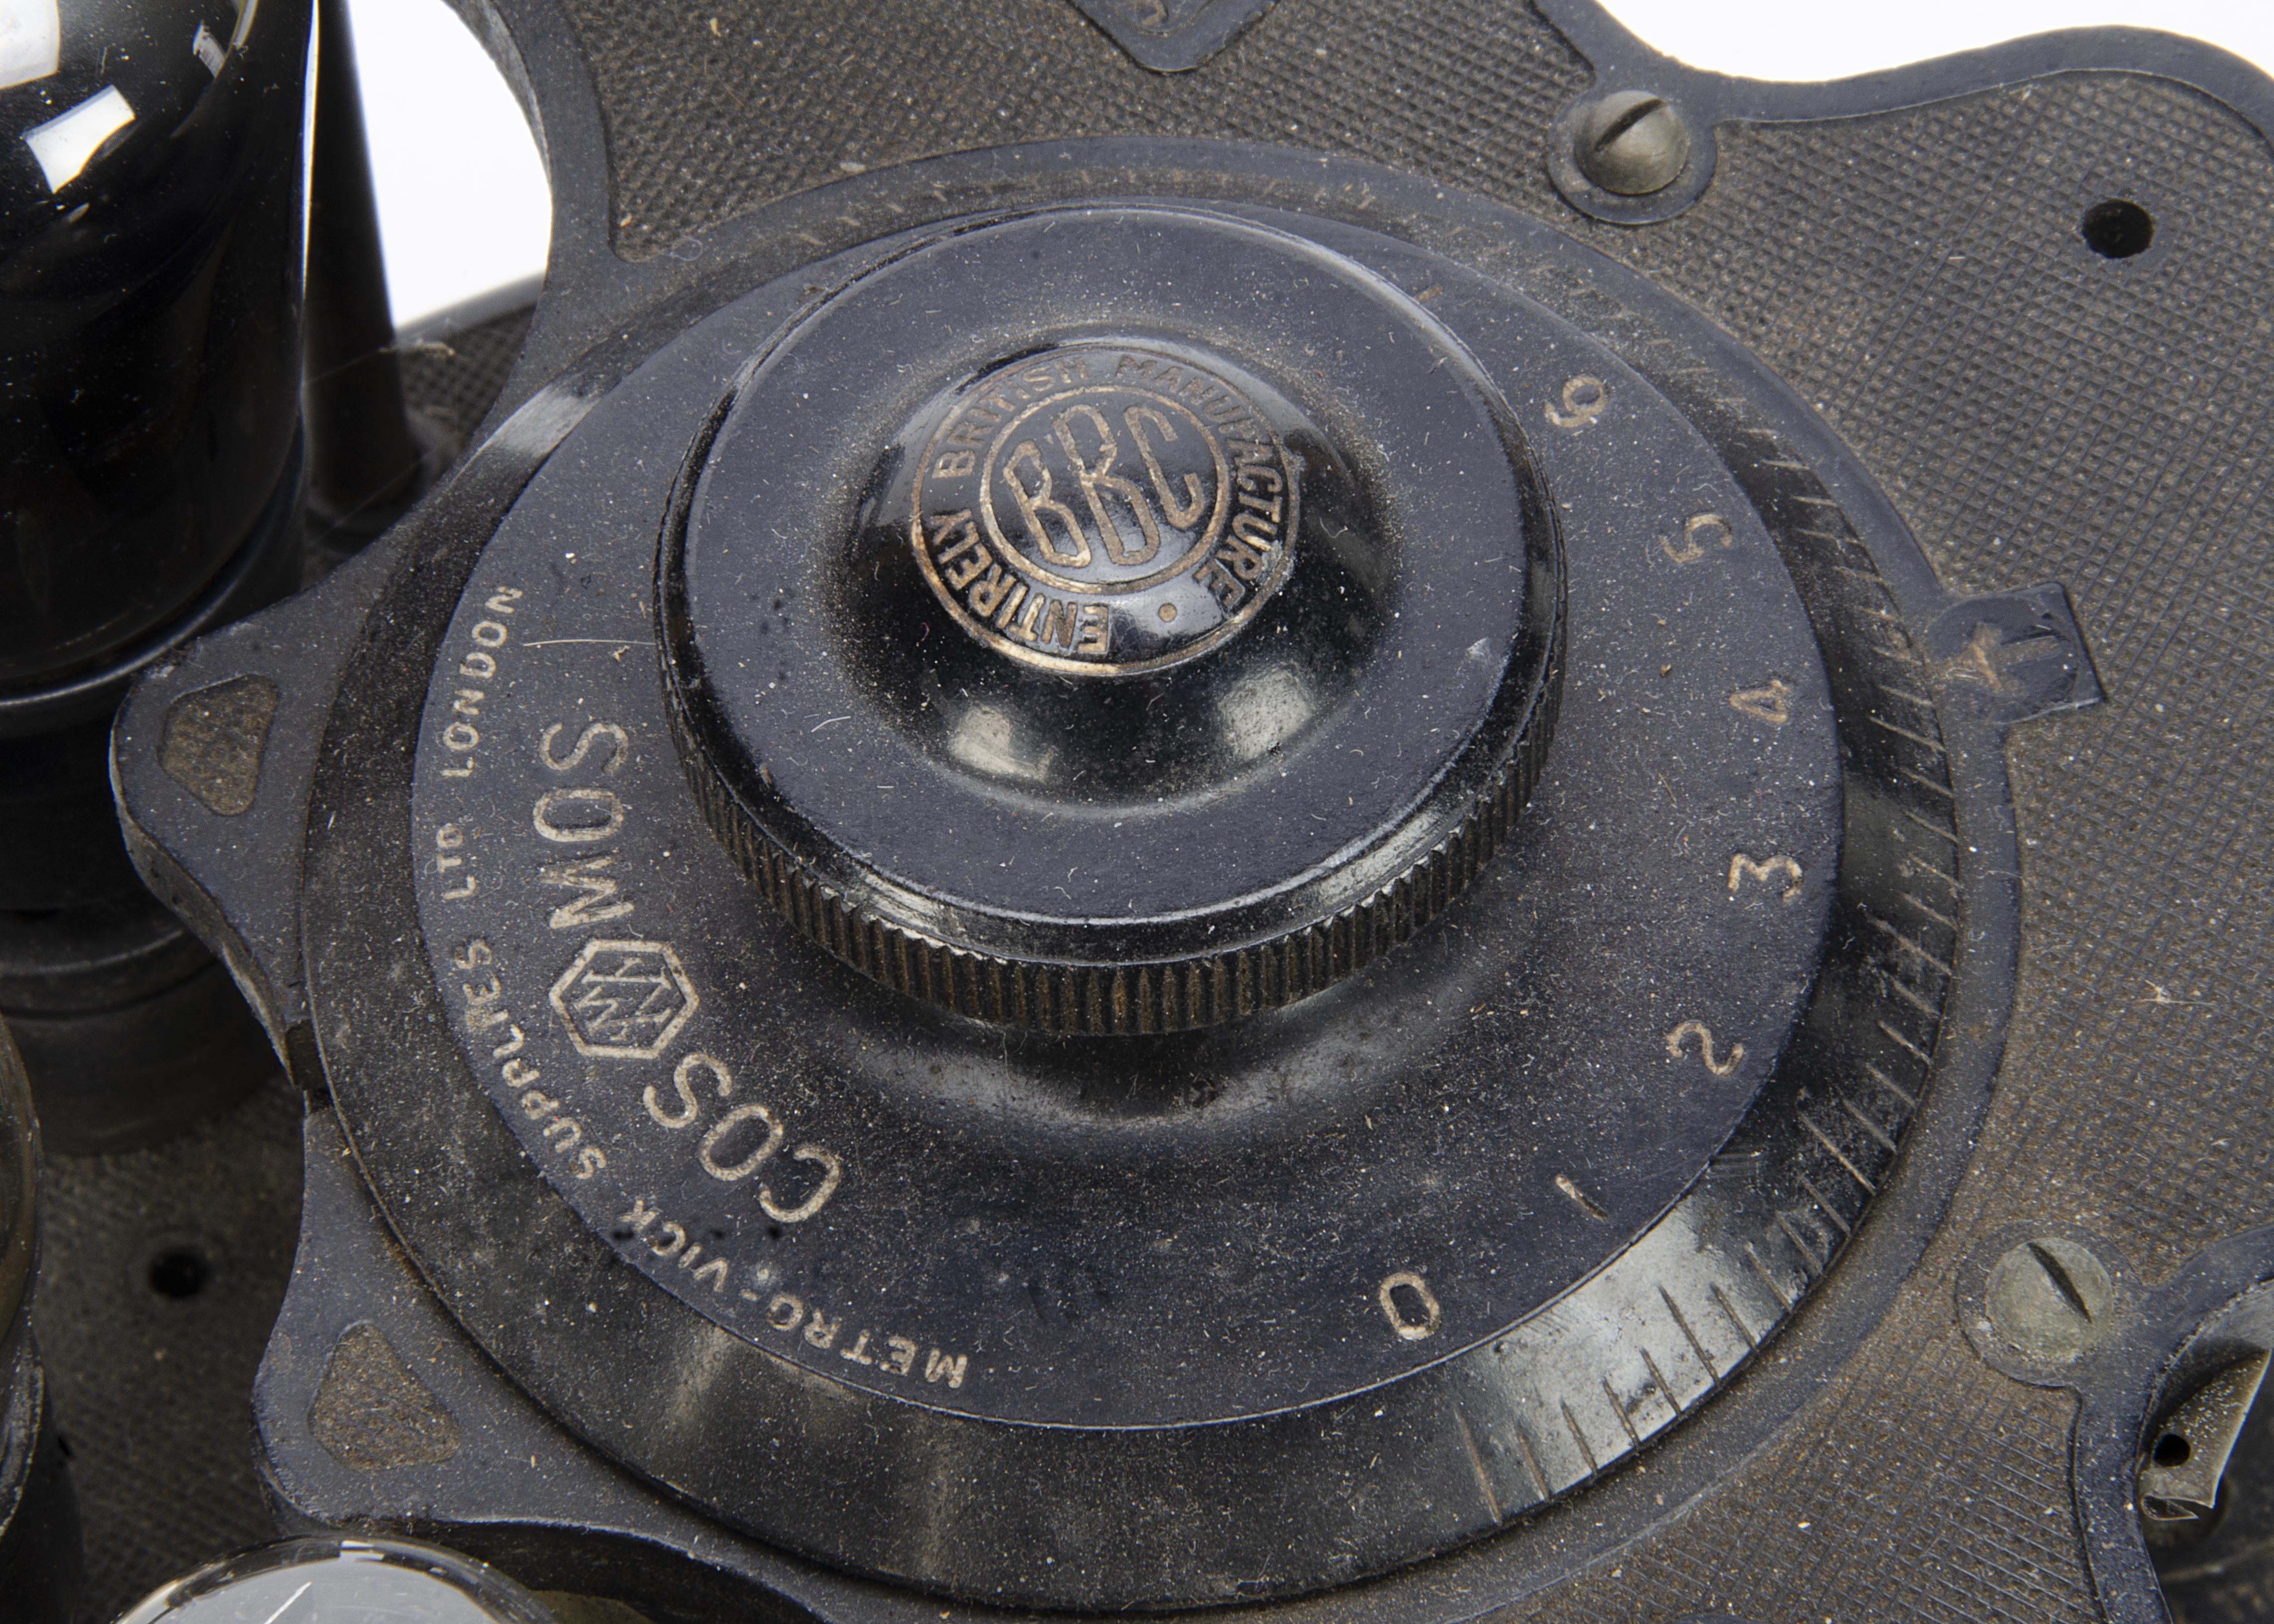 Cosmos Radiophone VR4, a Cosmos Radiophone VR4 'Cruet Set' 3 valve wireless receiver CAT No:89591 - Image 3 of 3